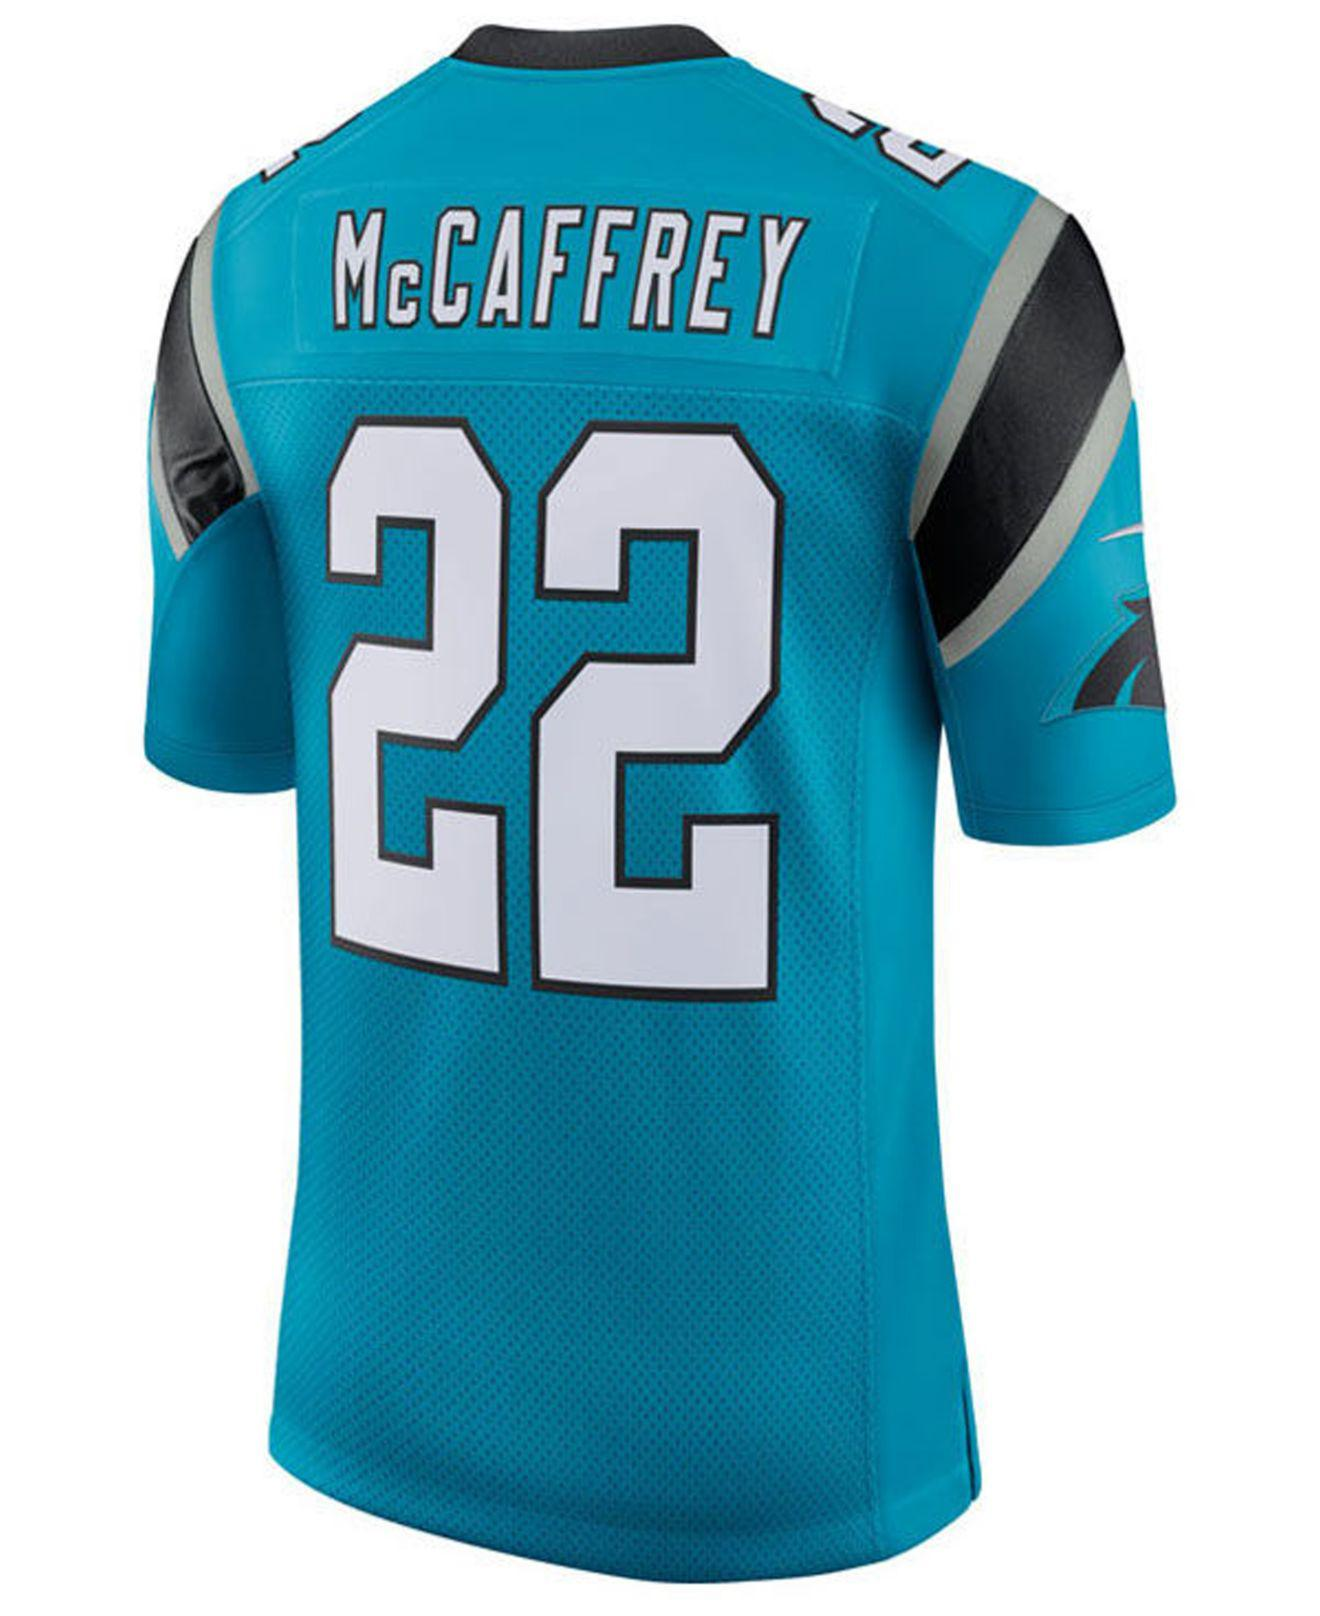 1b99b9068bb Lyst - Nike Christian Mccaffrey Carolina Panthers Limited Jersey in ...